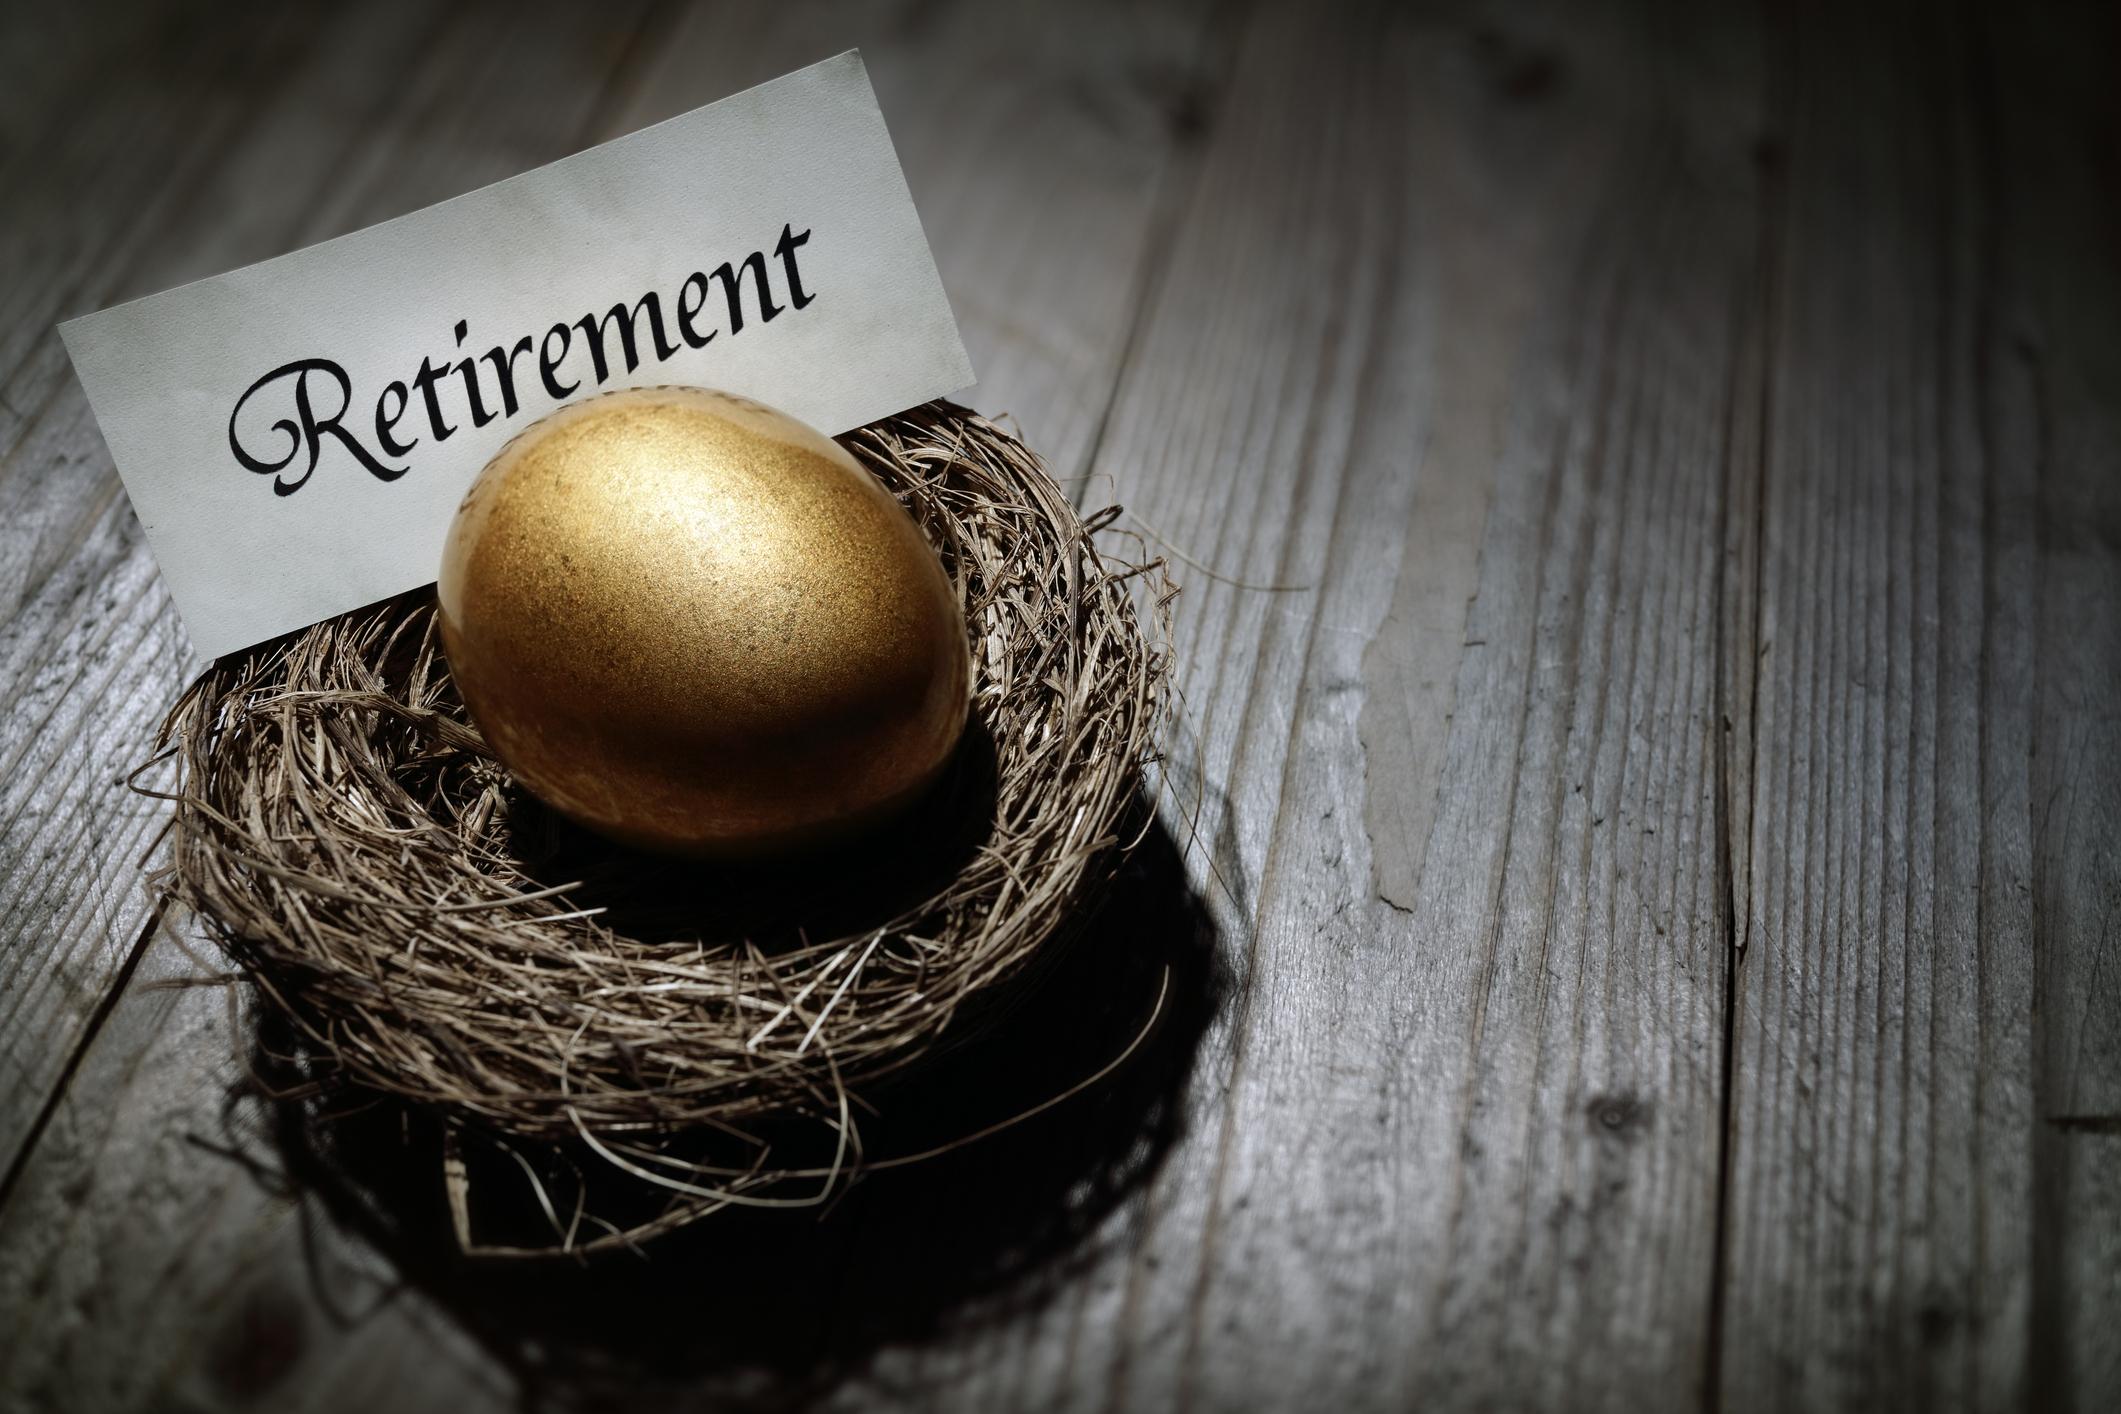 Retirement golden egg GettyImages-655781780